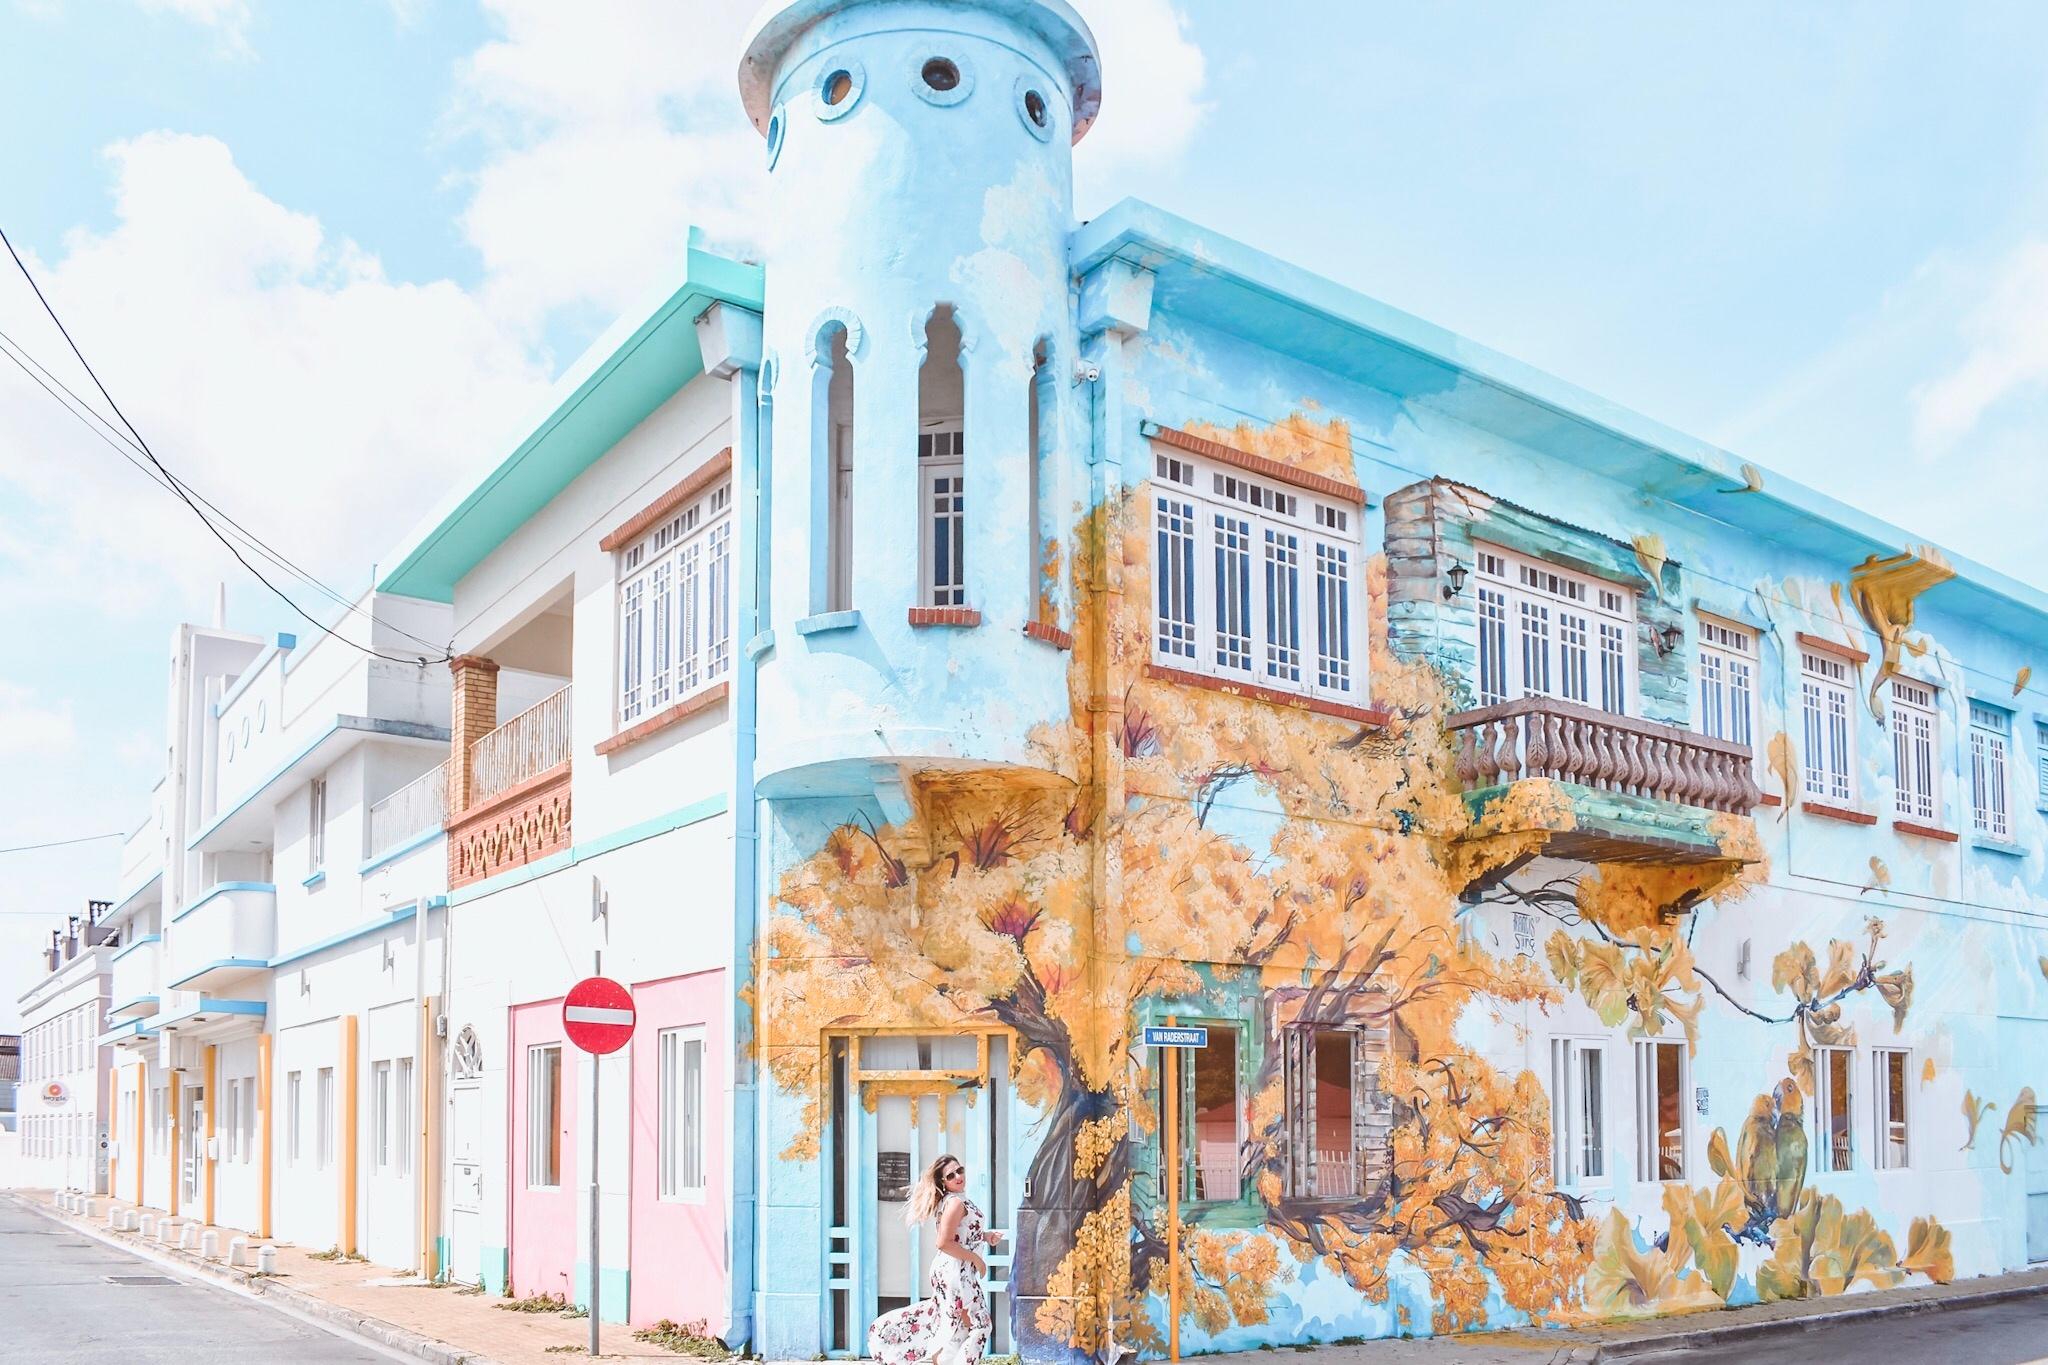 Curaçao Willemstad Schaarloo street art